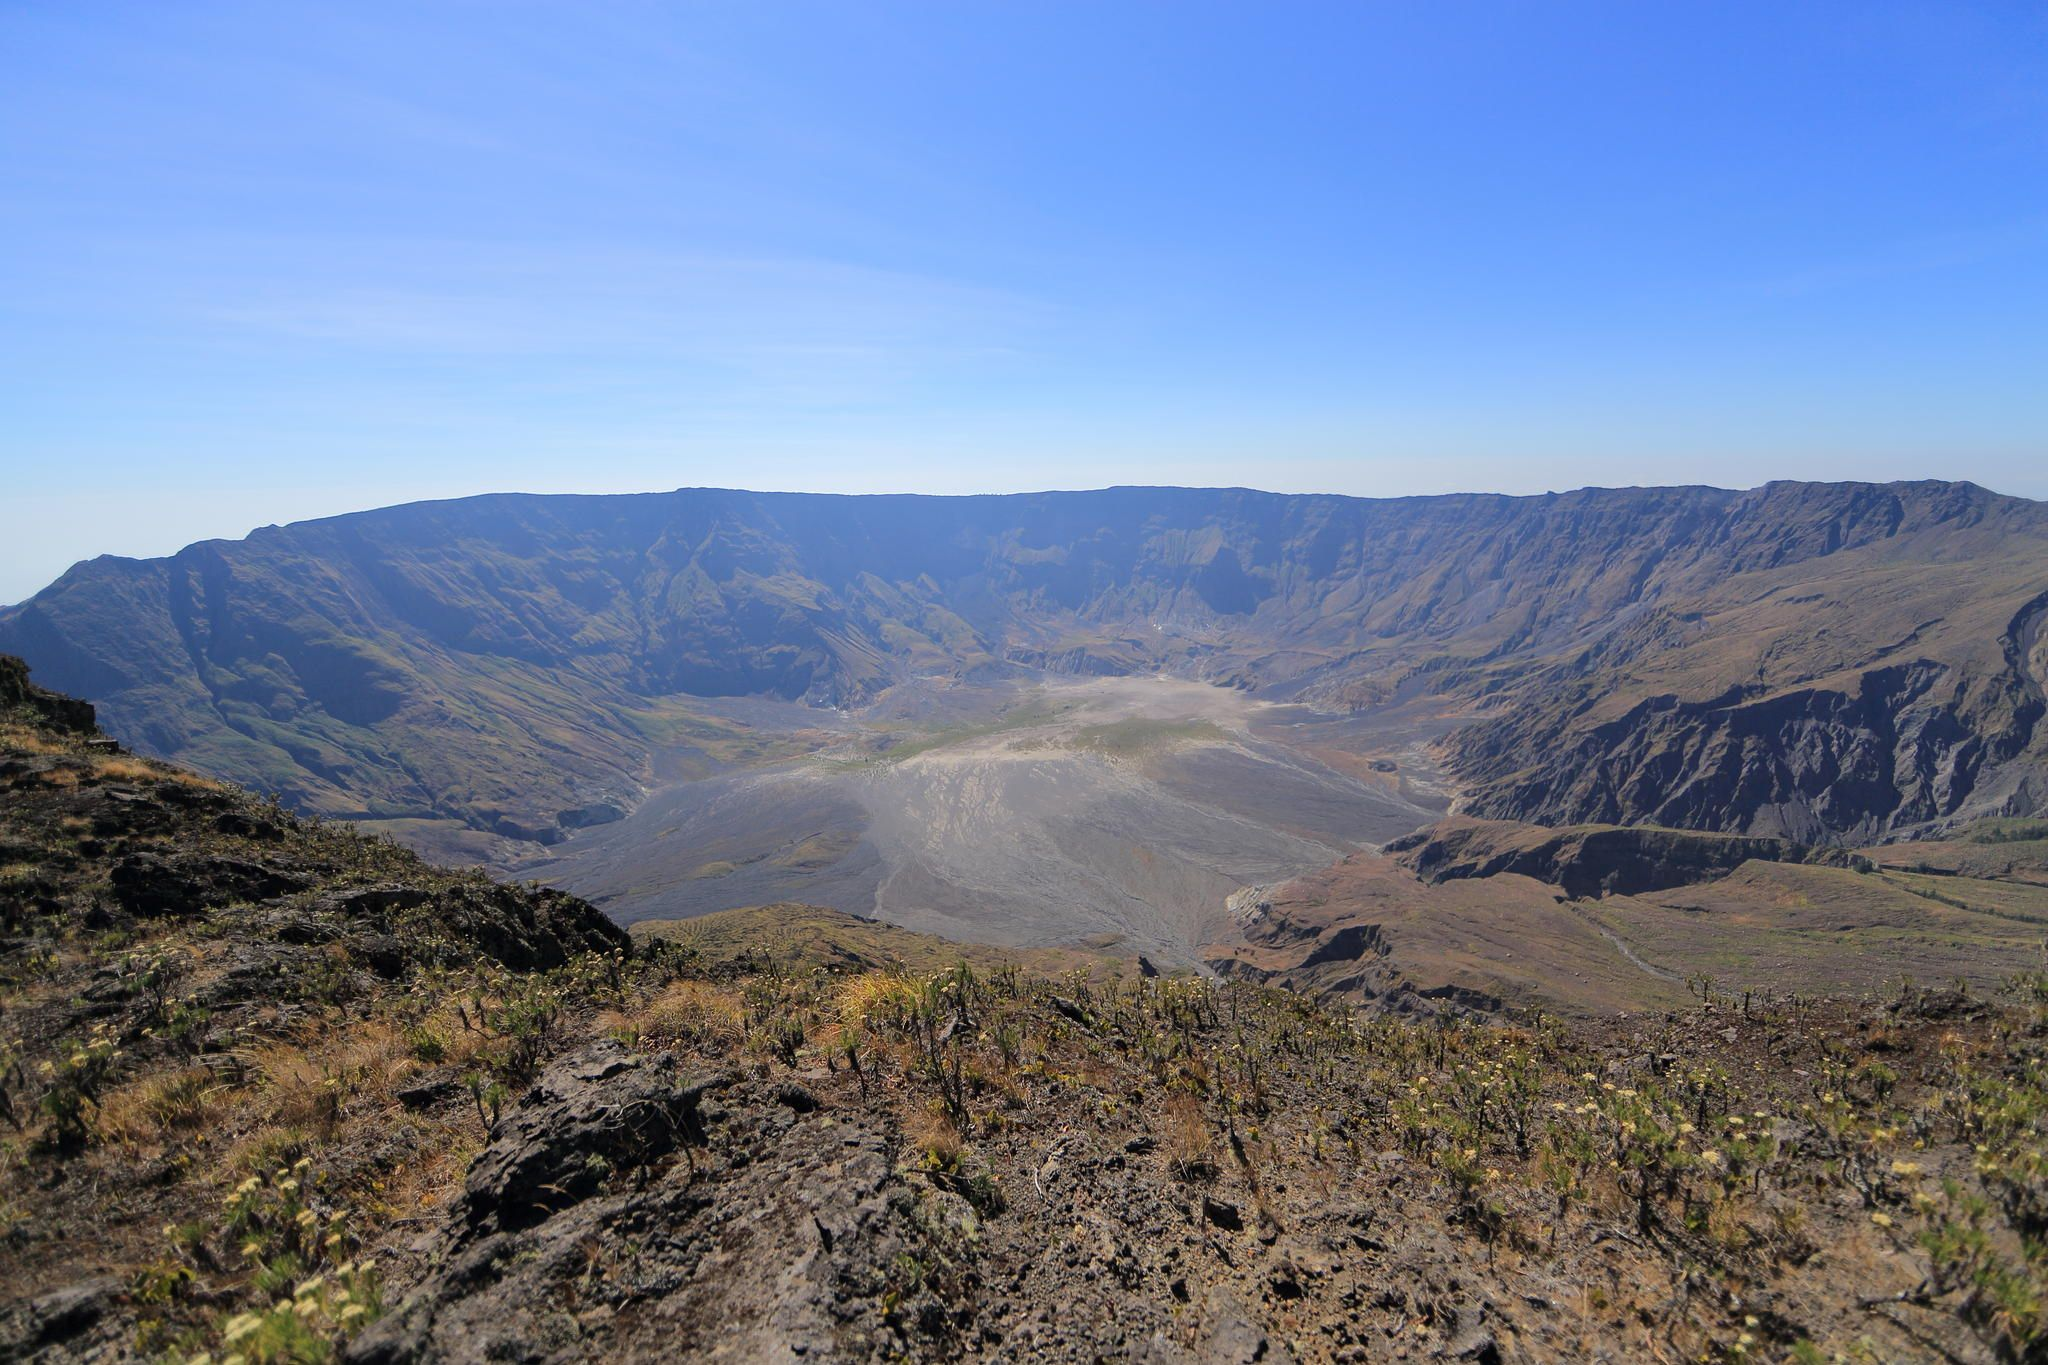 Tambora Crater. Sumbawa, Nusa Tenggara Barat, Indonesia by